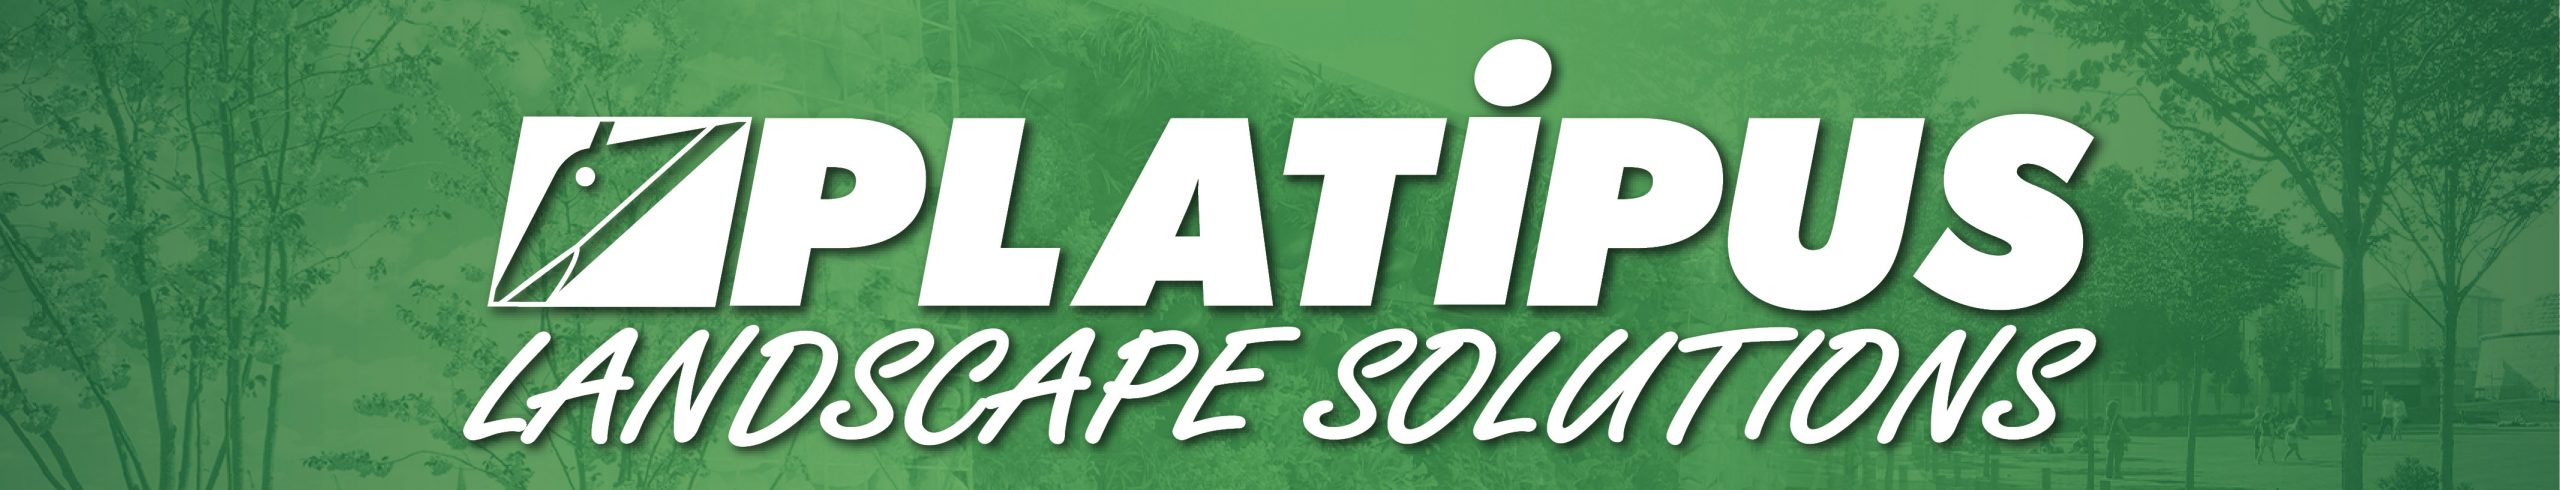 Platipus Landscape Solutions - 2021 Webinars with guest hosts